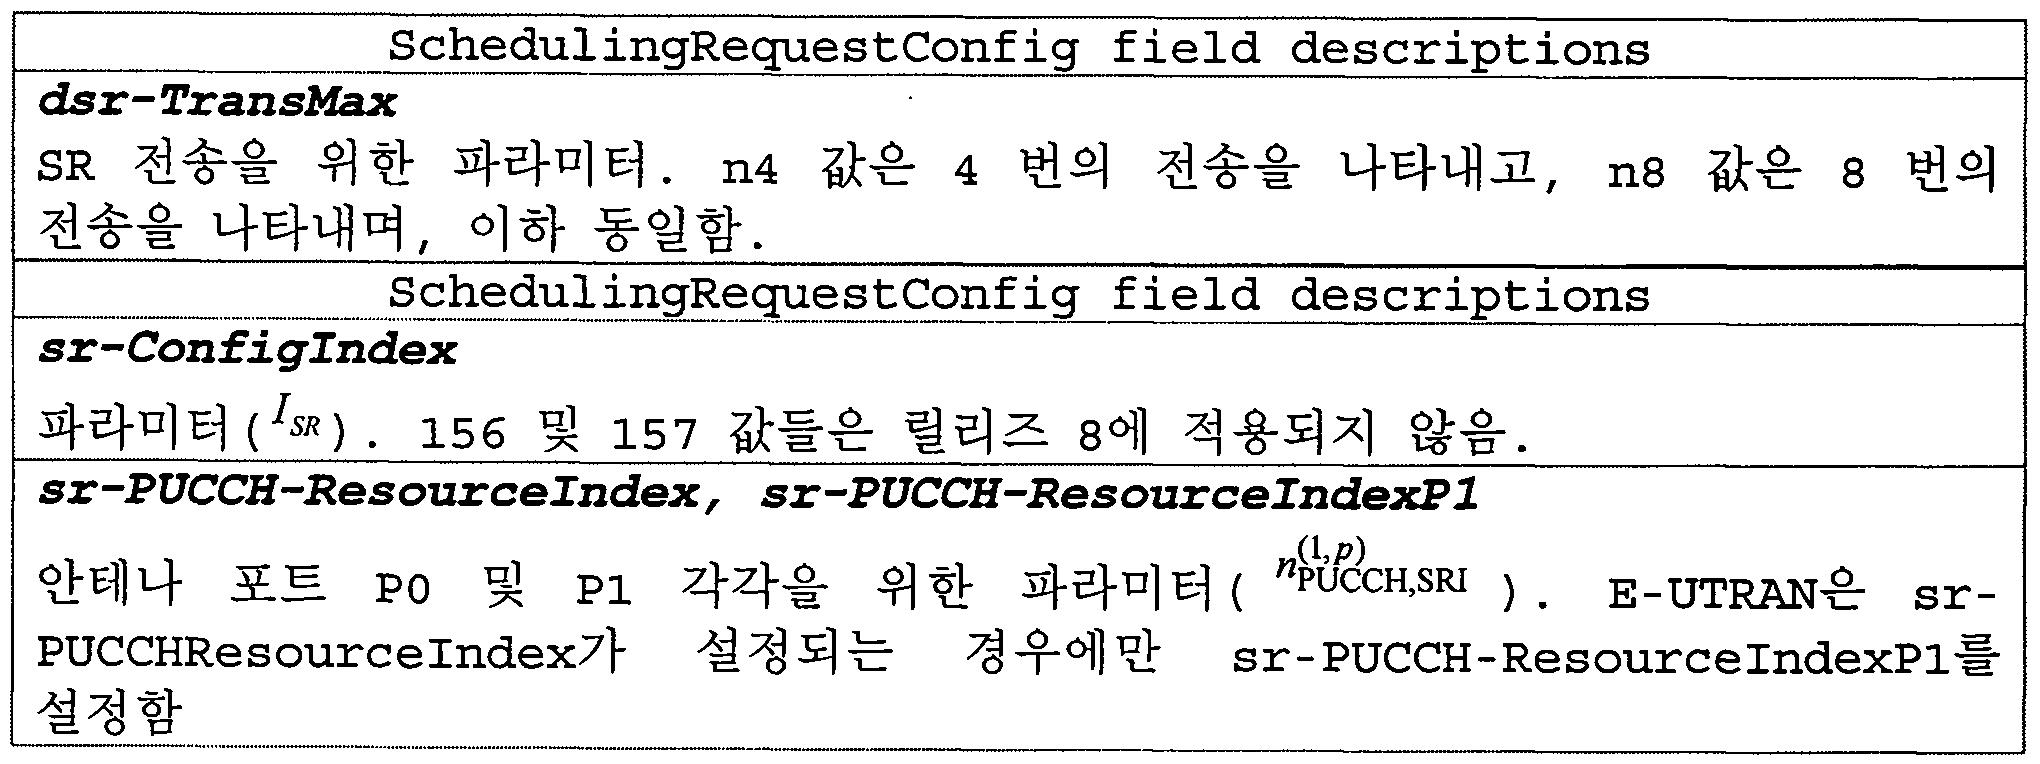 Figure 112016503215164-pct00010